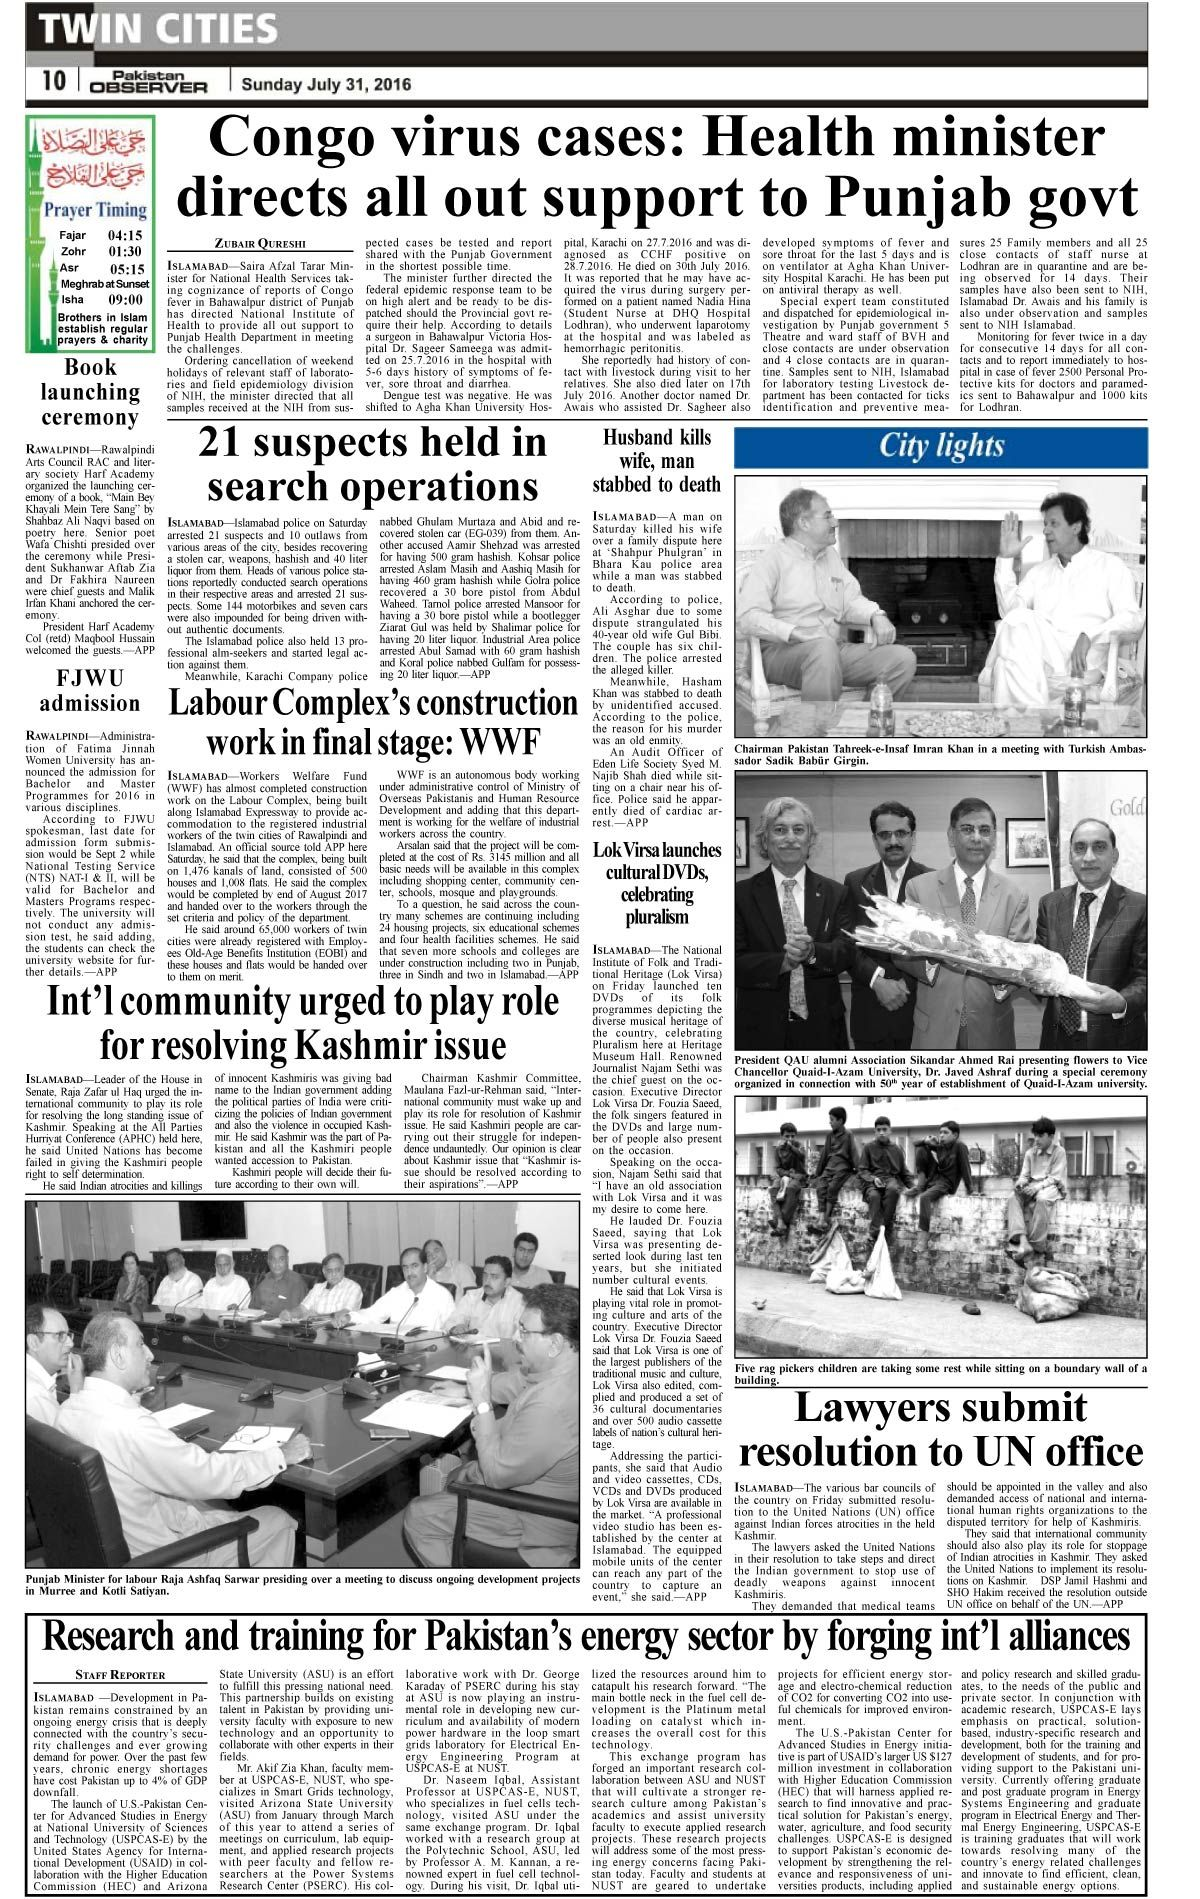 Islamabad | playwrites@yahoo com | Headline news, Sports